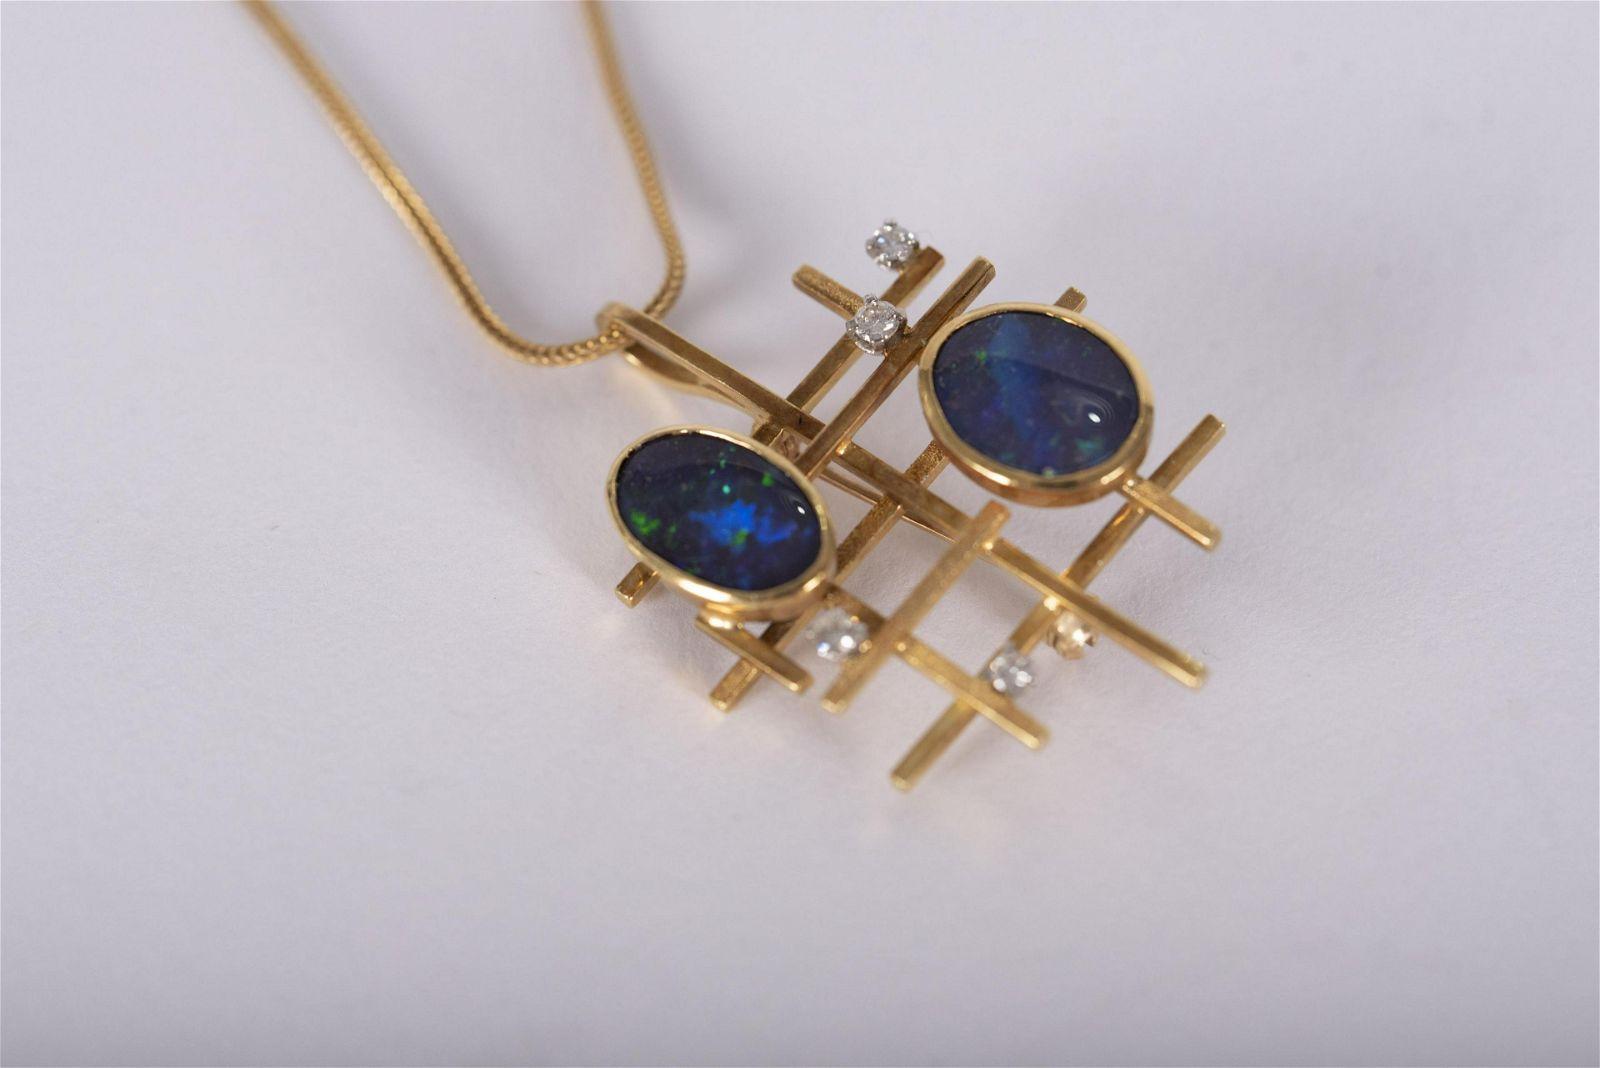 Modernist Design Fire Opal and Diamond Pendant